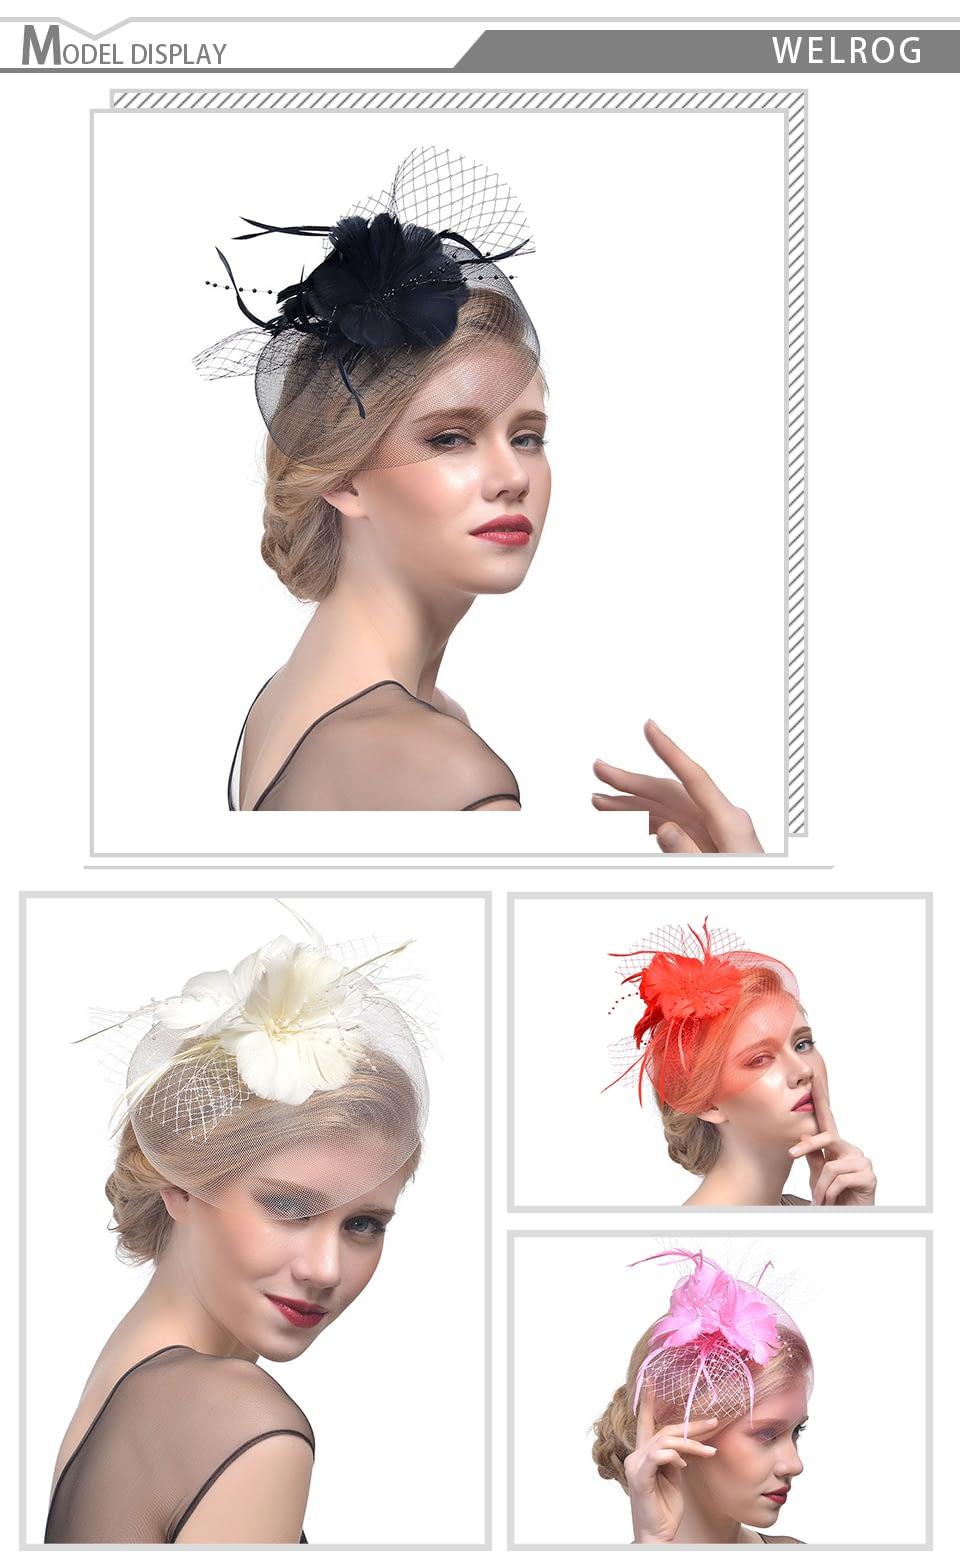 Fashion Feather Cap, Lady Cocktail Dinner, Formal Vintage Sombreros, Chapeau Fascinators Hat 11